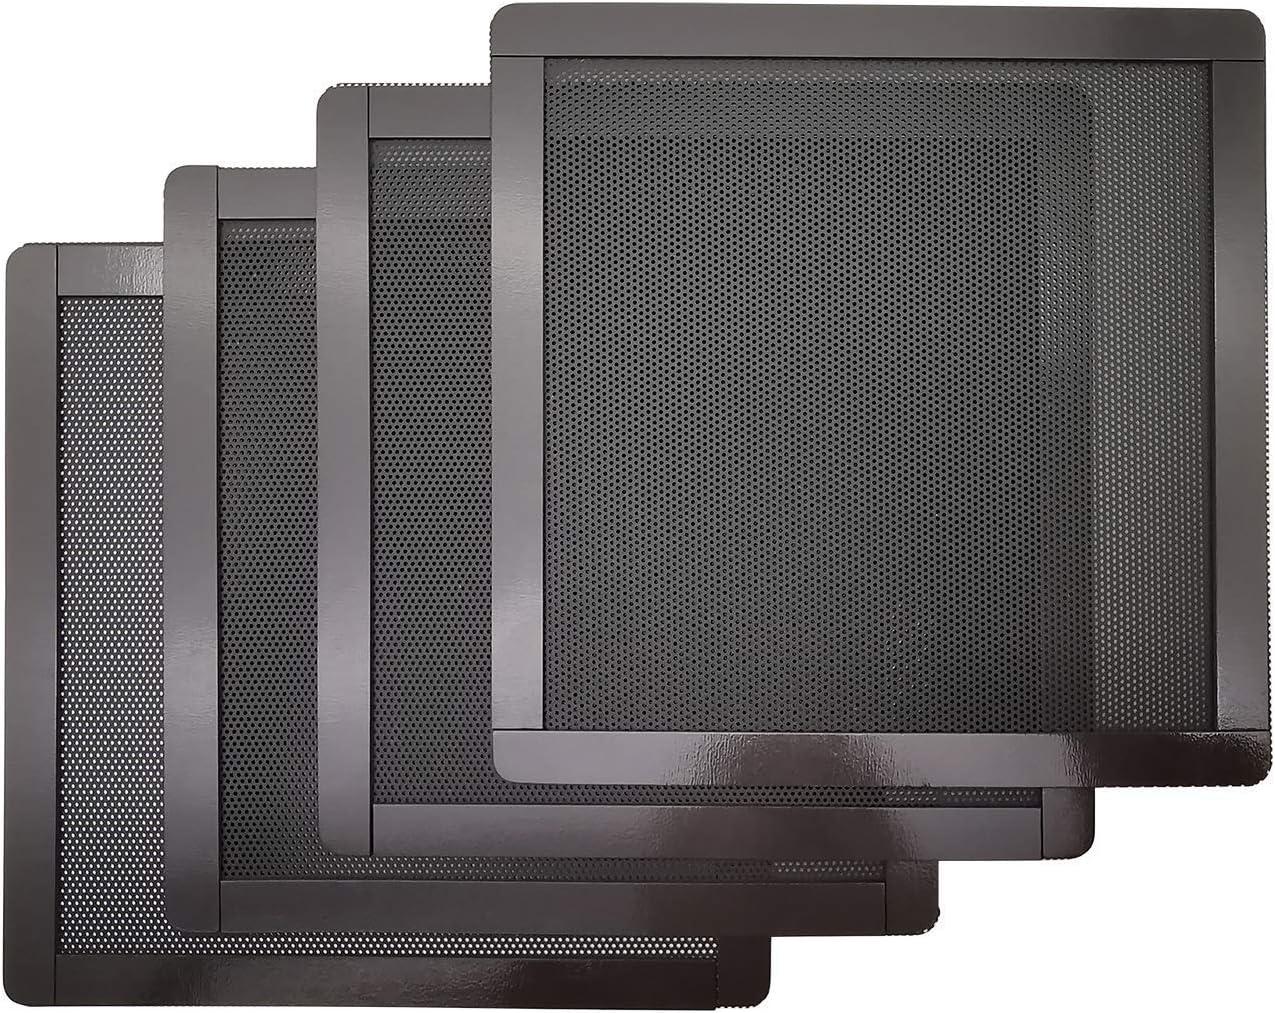 140mm PC Computer Case Fan Magnetic Frame Dust Filter Screen Dustproof Case Cover, Ultra Fine PVC Mesh, Black Color - 4 Pack